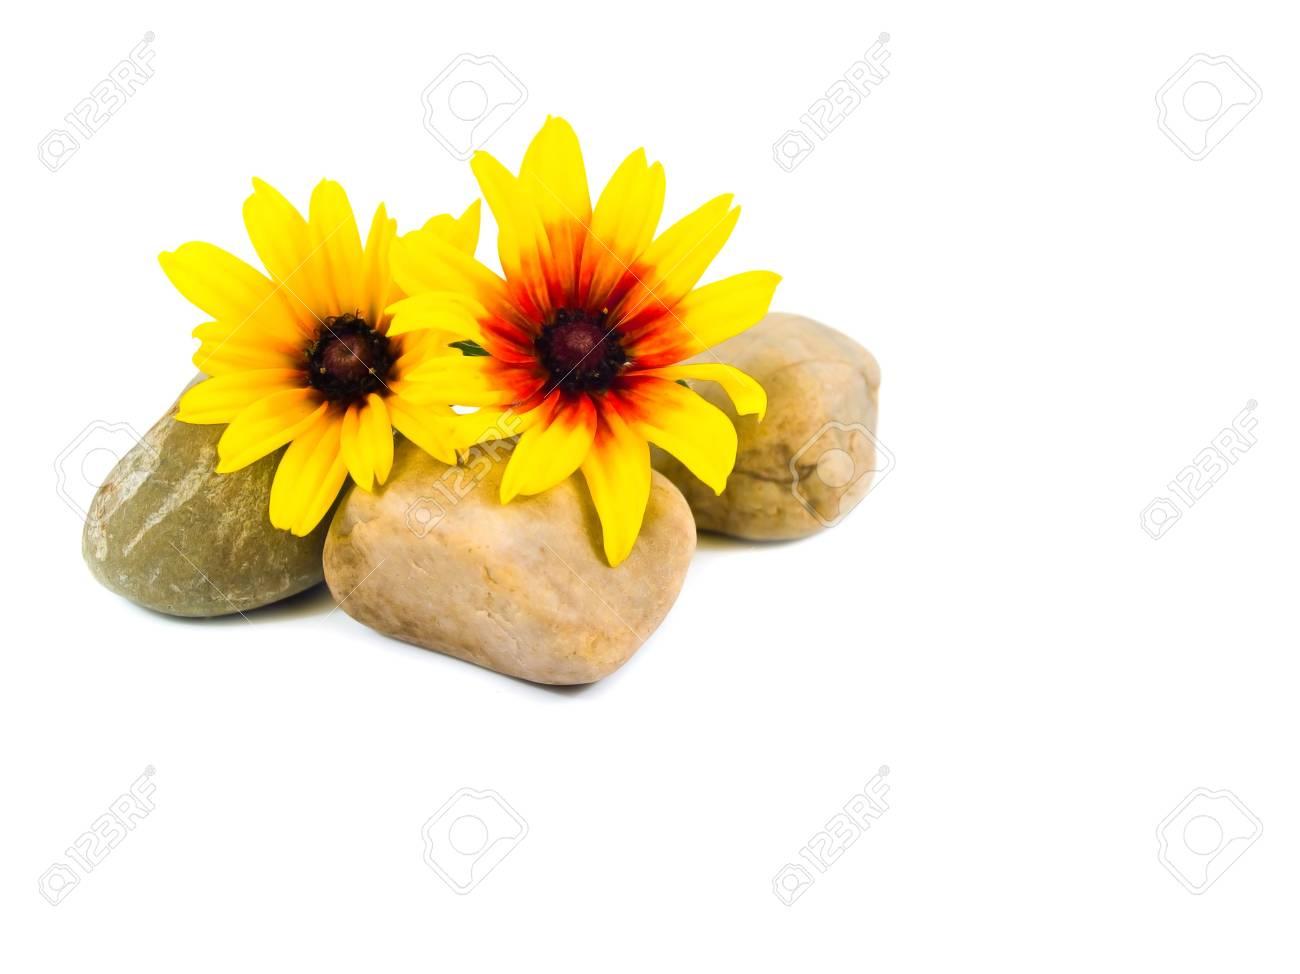 Yellow Daisies on Gray Stones Isolated on White Stock Photo - 8463782